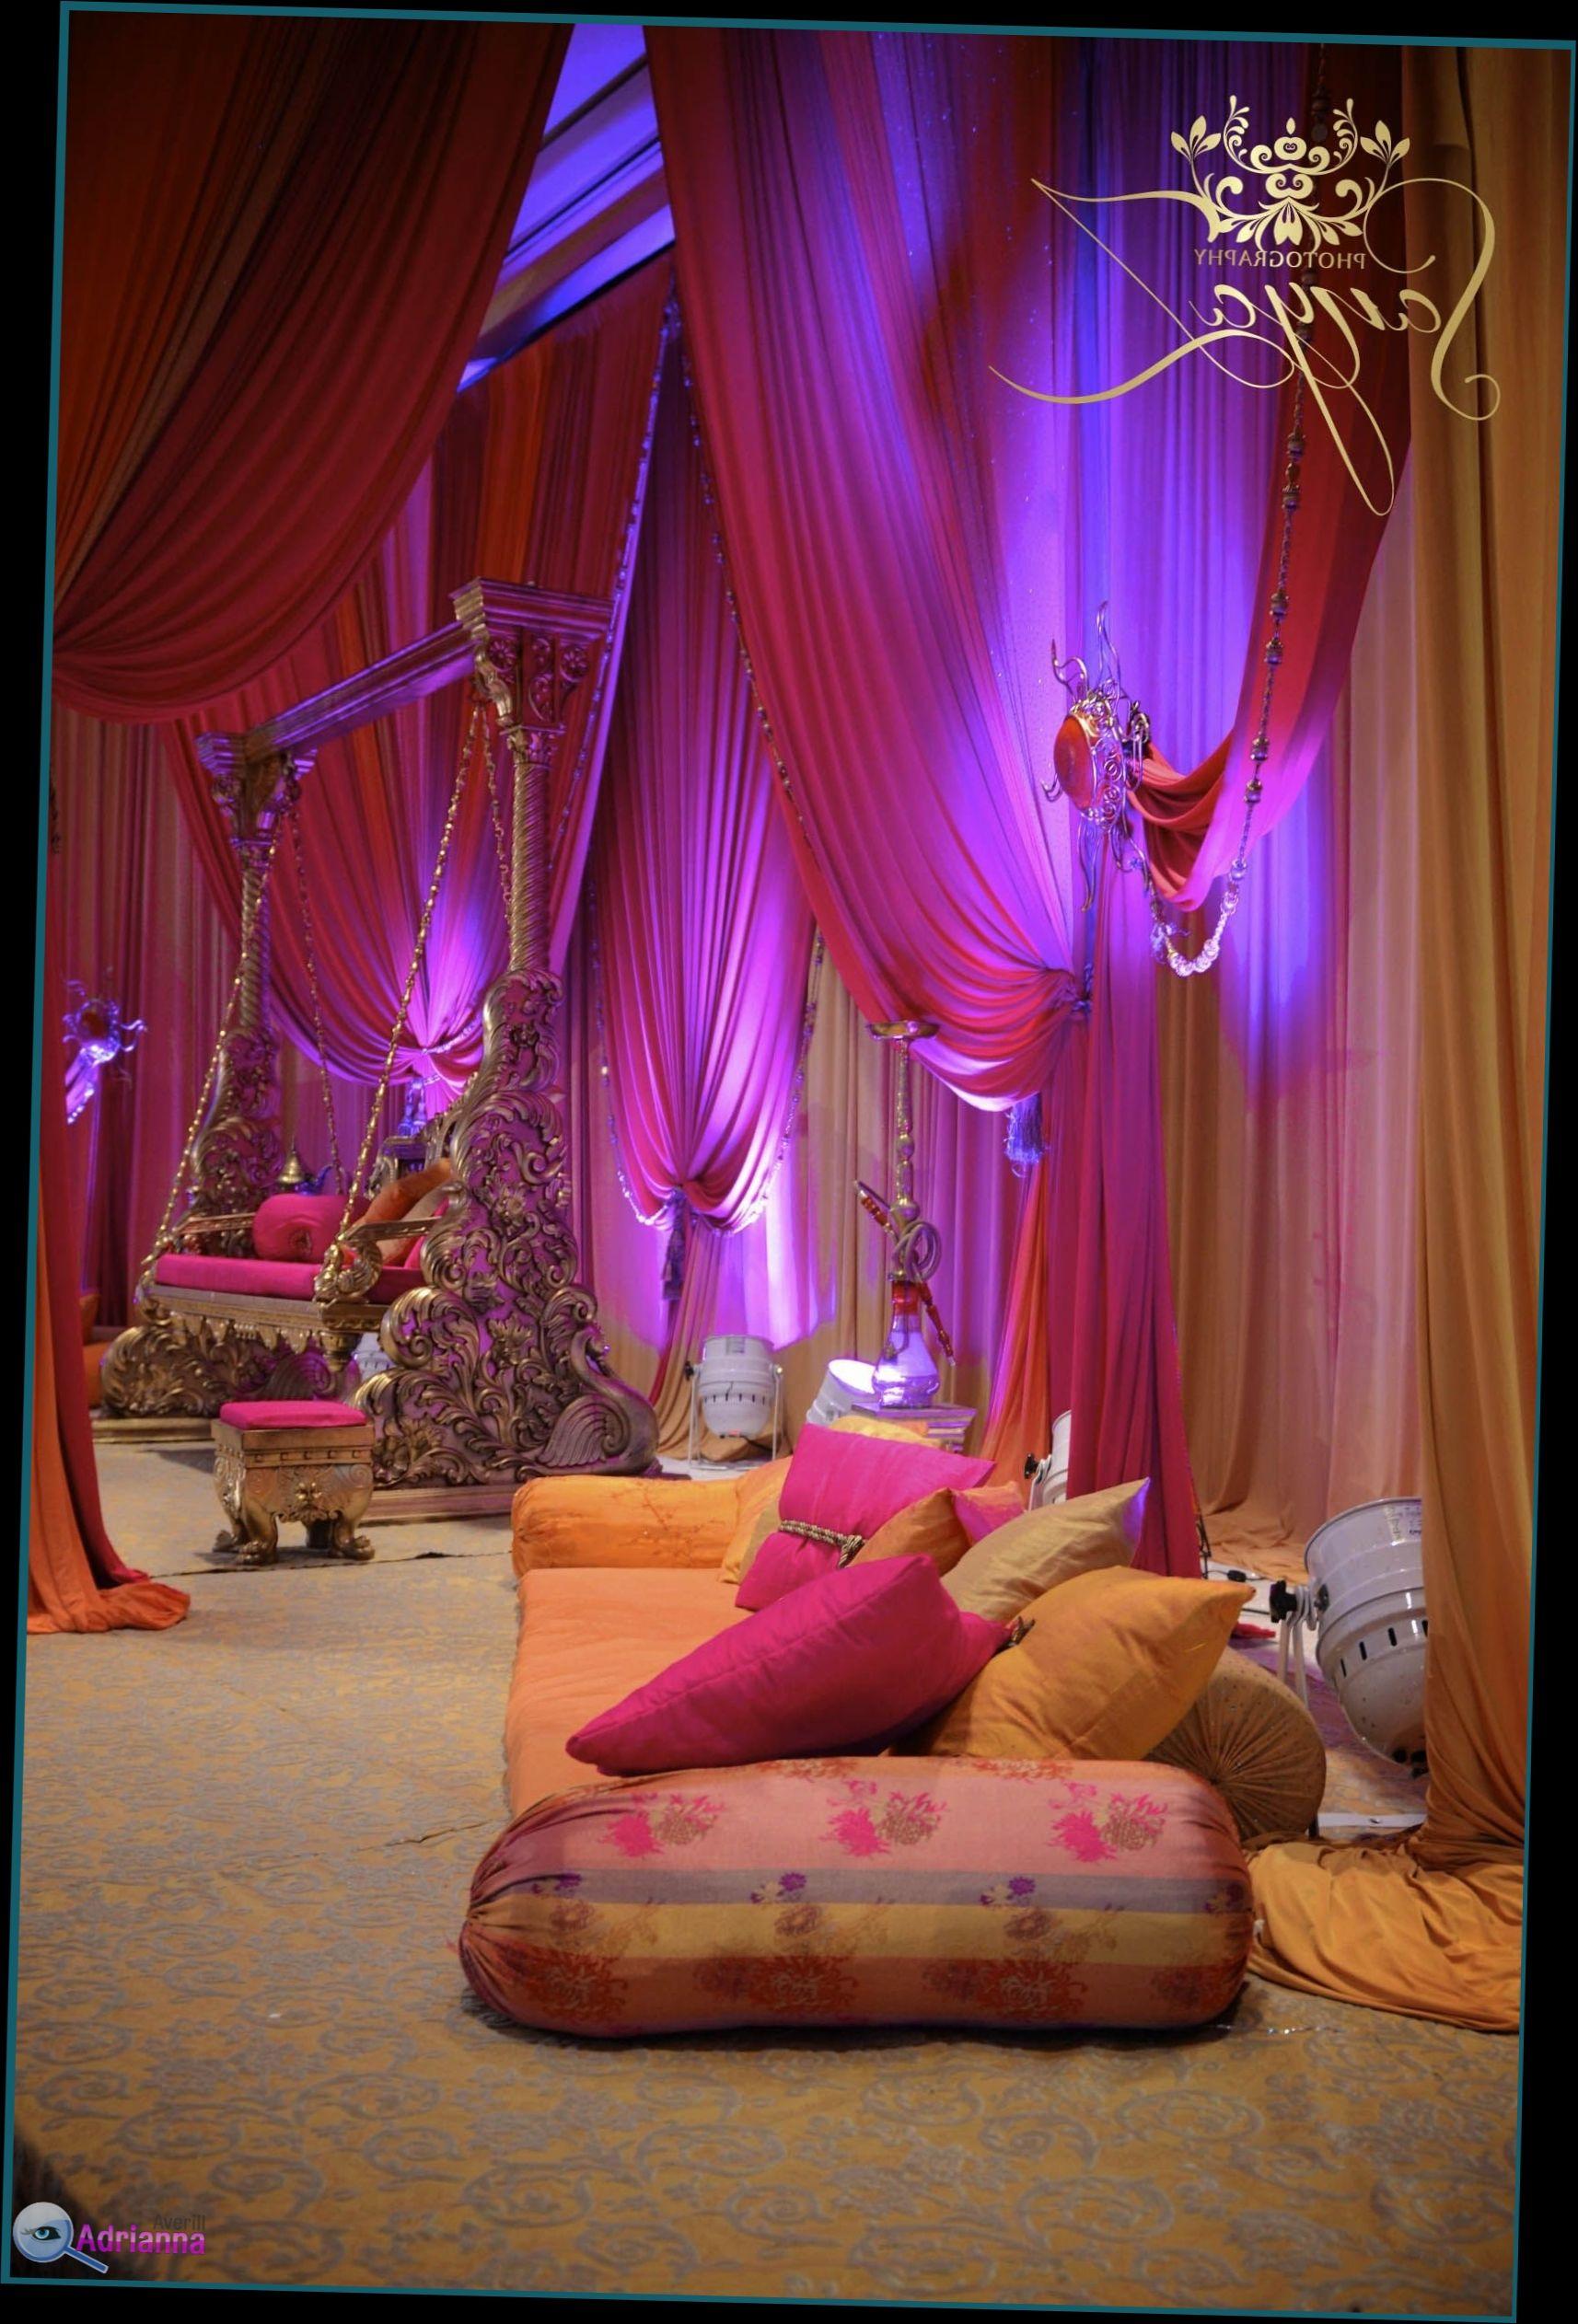 Indian Wedding Bedroom Decoration Indian Wedding Bedroom Decoration Memphissoul50 Com This Image Is Pro Theme Room Decor Room Makeover Interior Decor Themes